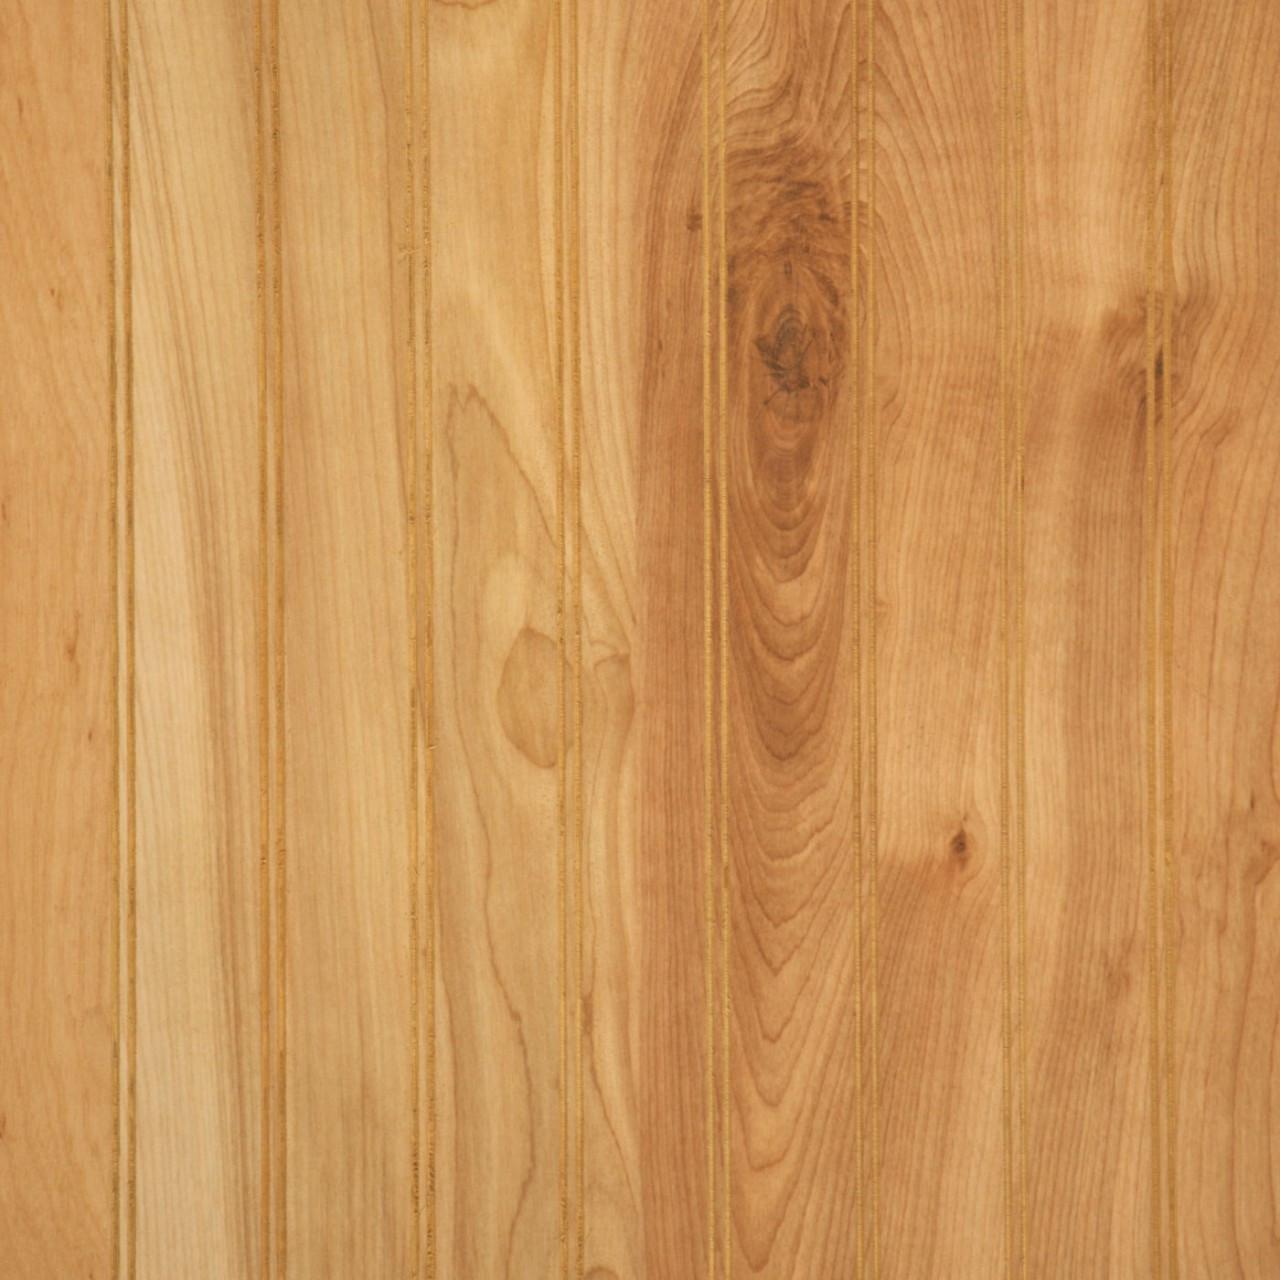 Natural Birch Beadboard Paneling  Woodgrain Finish Panels